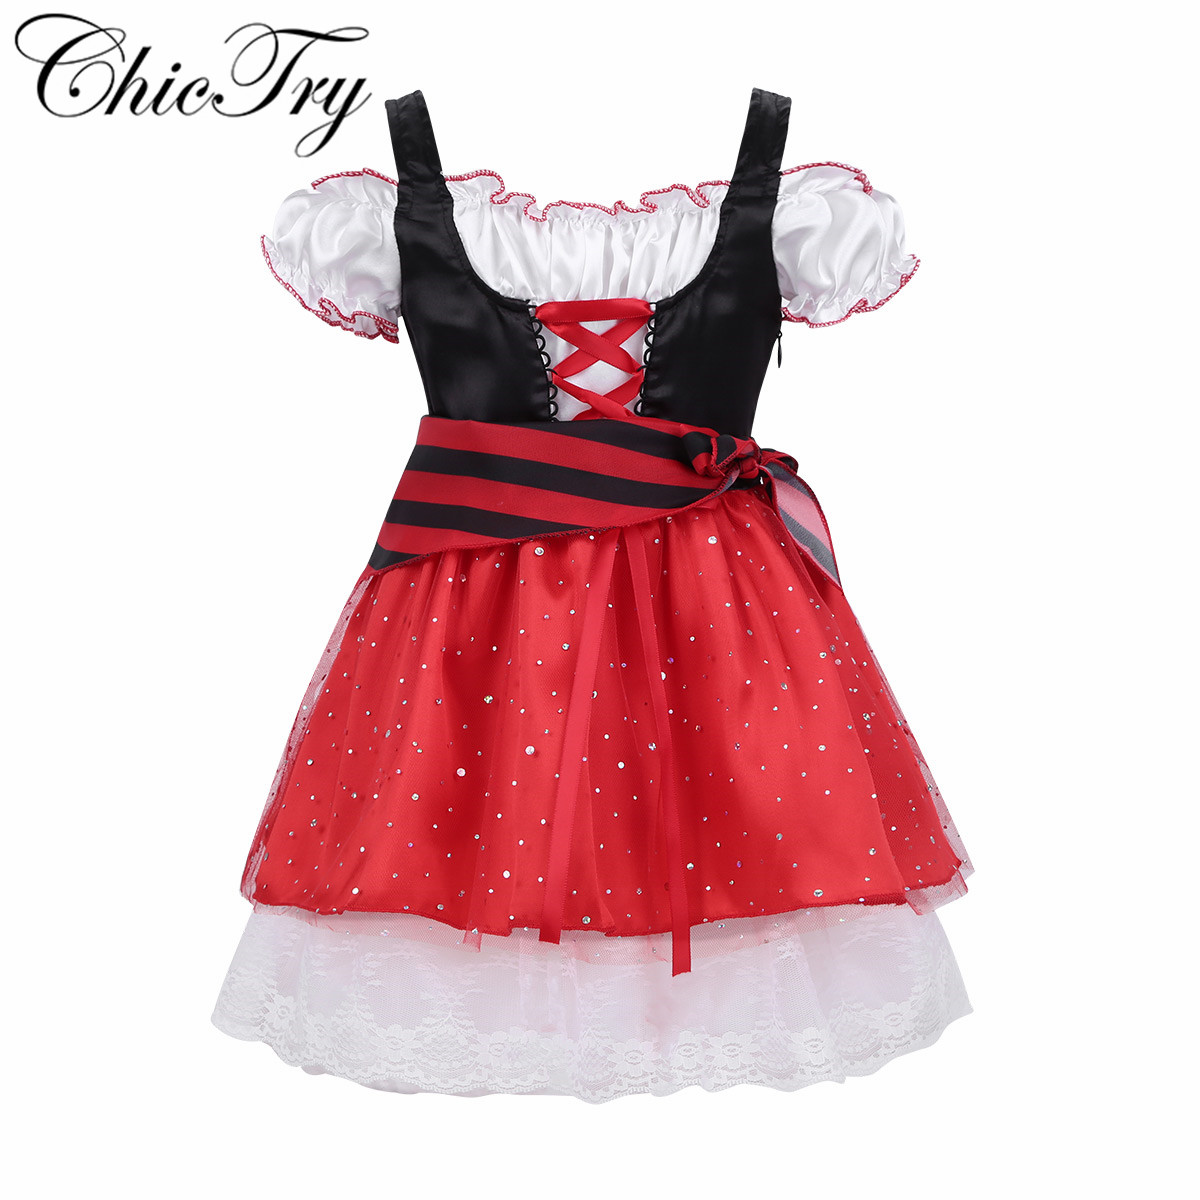 Little Girls Pirate Sequin Costume Off Shoulder Halloween Cosplay Party Dress